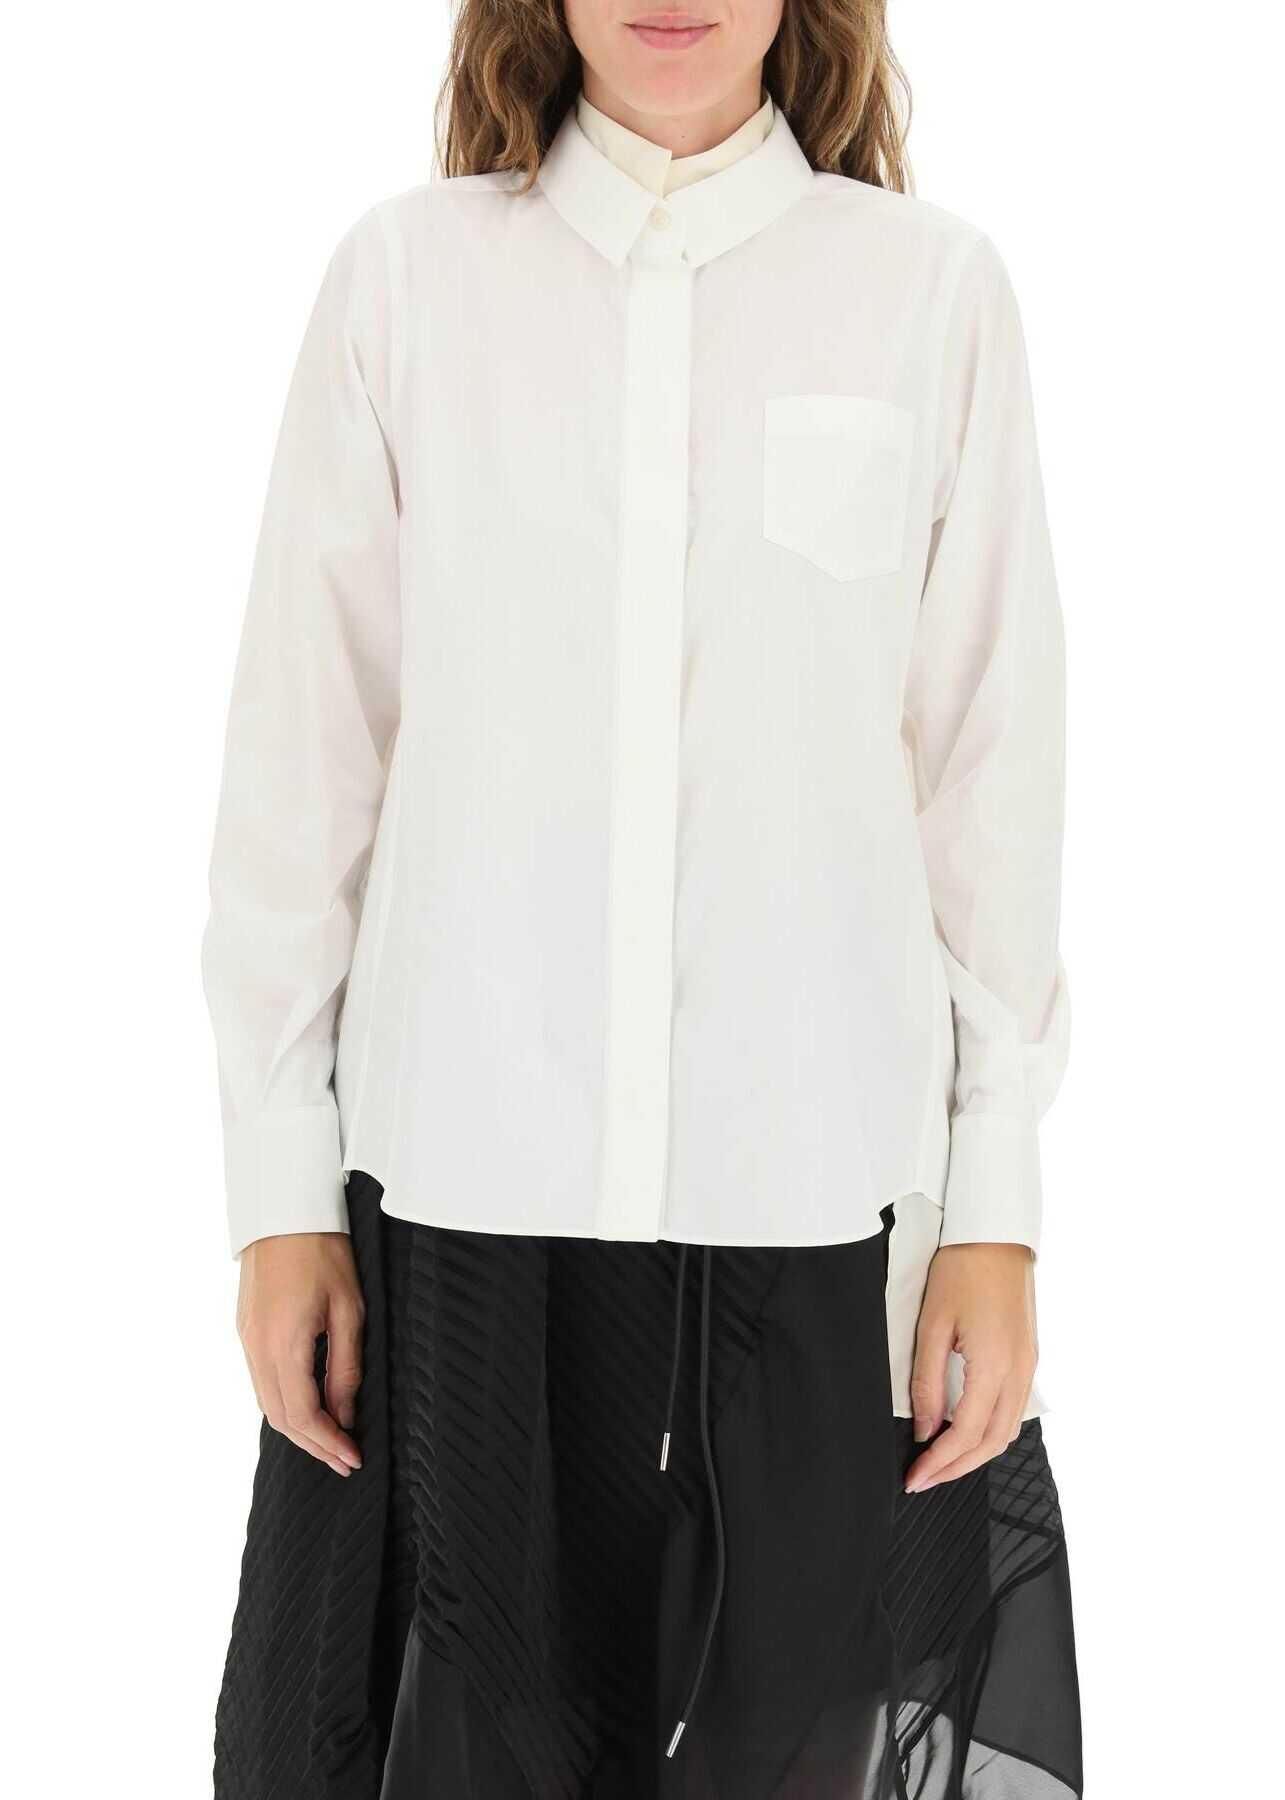 Sacai Shirt With Asymmetric Panel 21 05827 WHITE image0